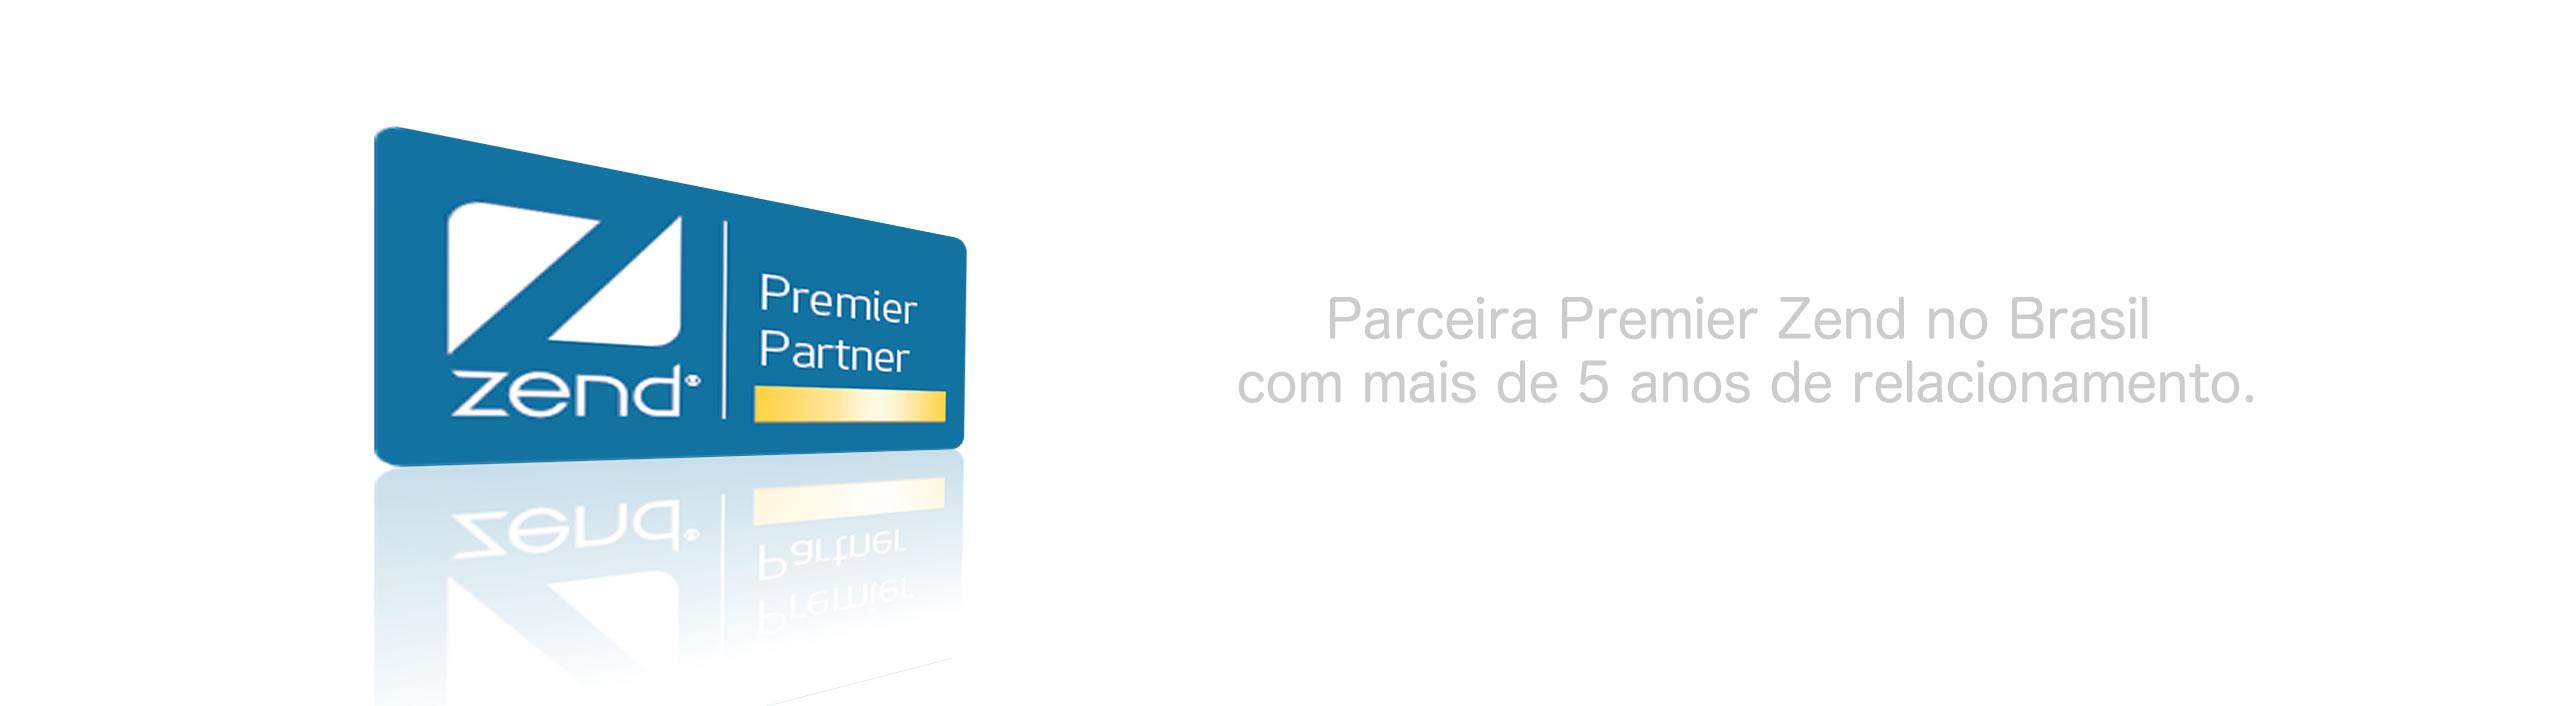 PremierPartner